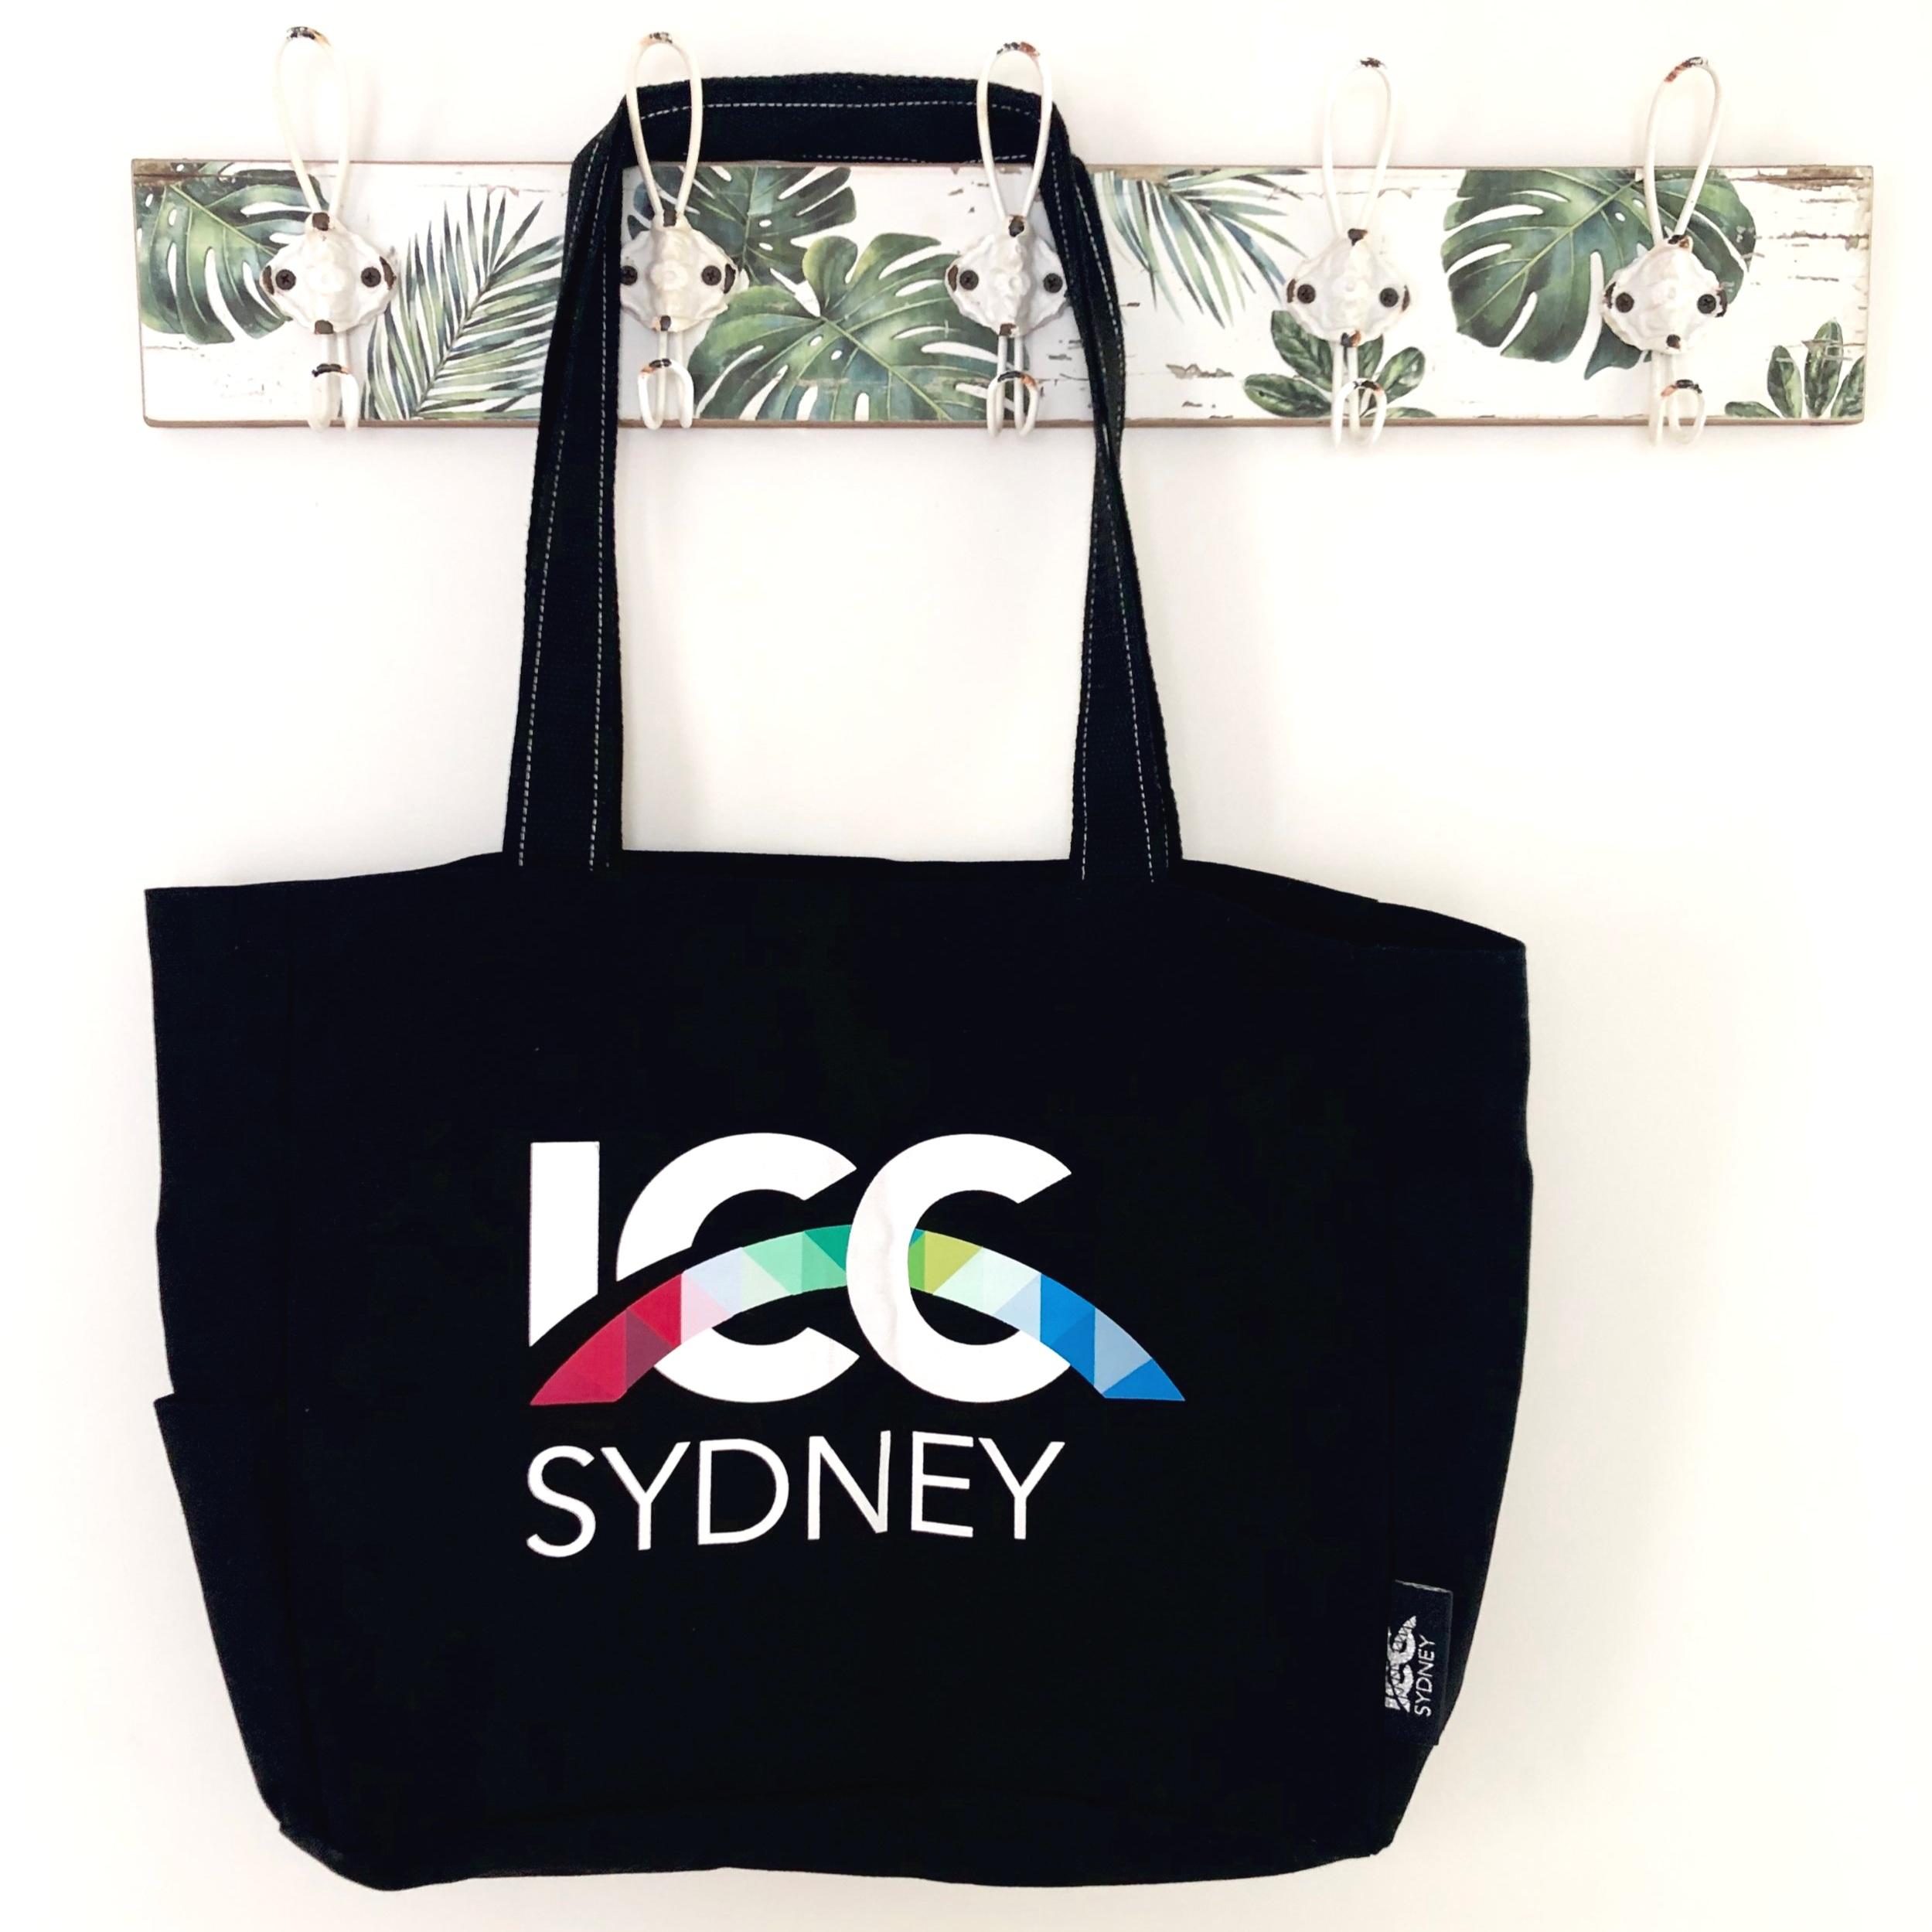 ICC Sydney Black.jpg